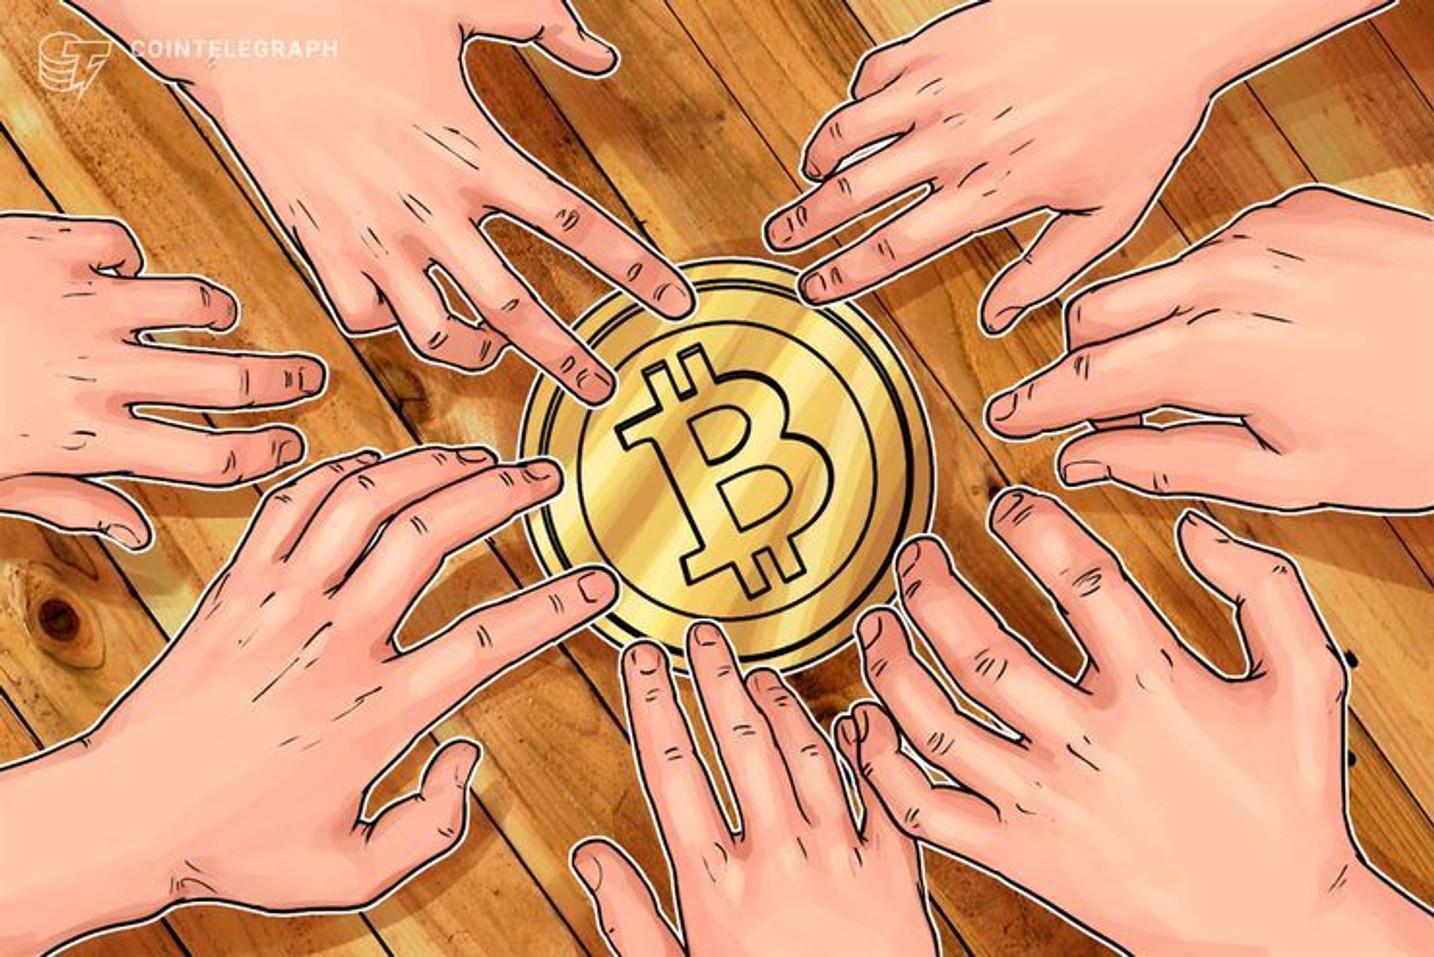 Justiça determina que E-Bit FX, suposta pirâmide de bitcoin de Araçatuba, restitua R$ 52 mil a cliente